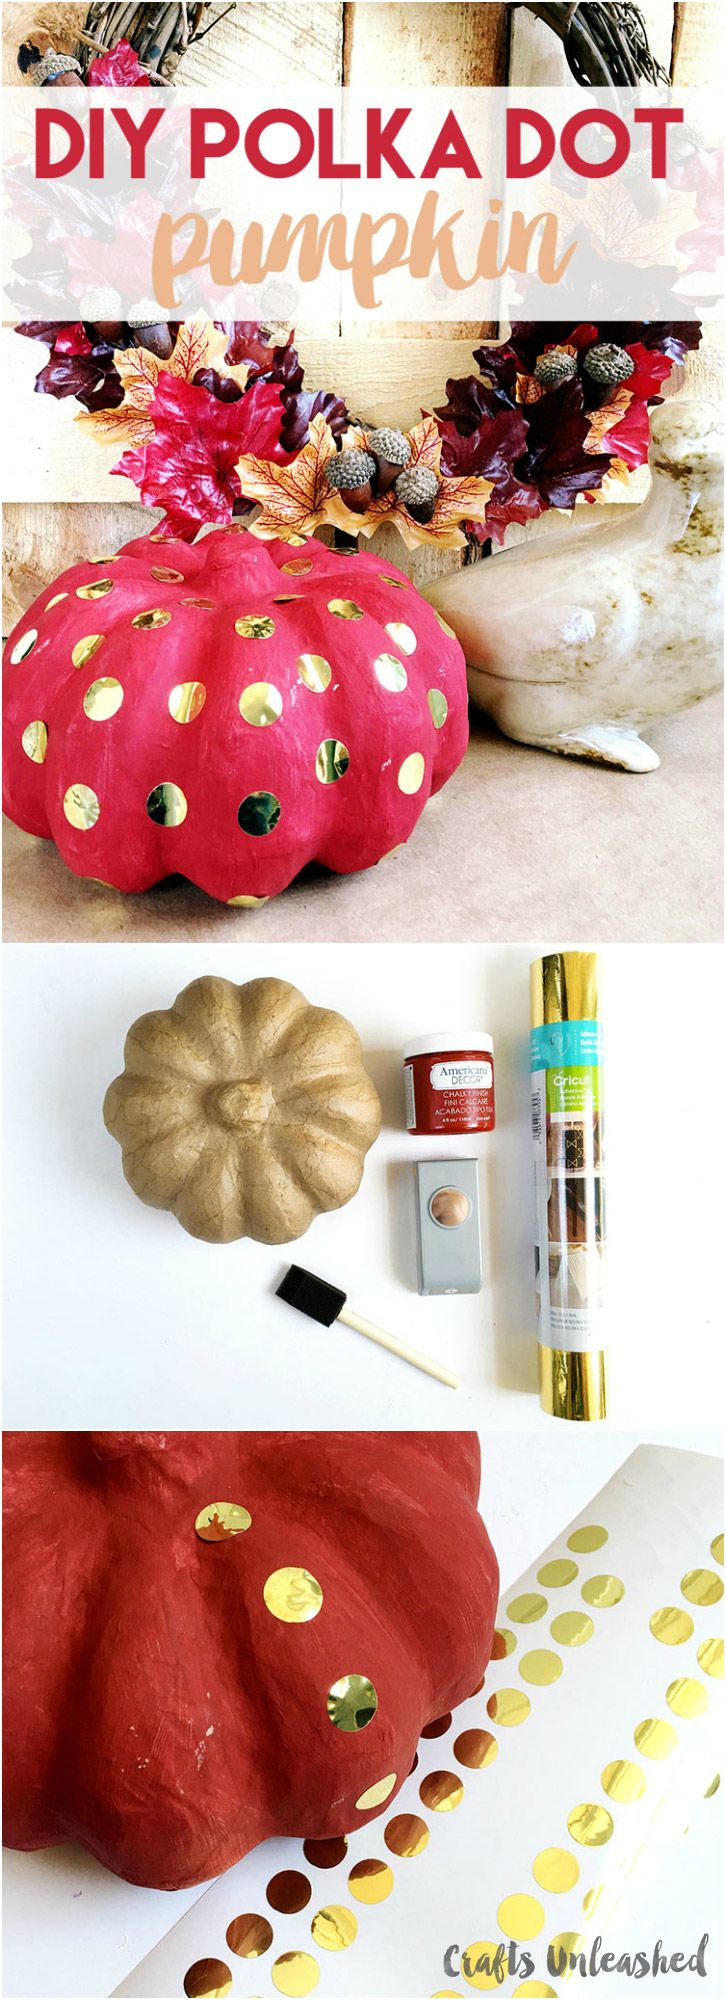 Diy thanksgiving paper decor - Polka Dot Pumpkin Diy With Gold Foil Consumer Crafts